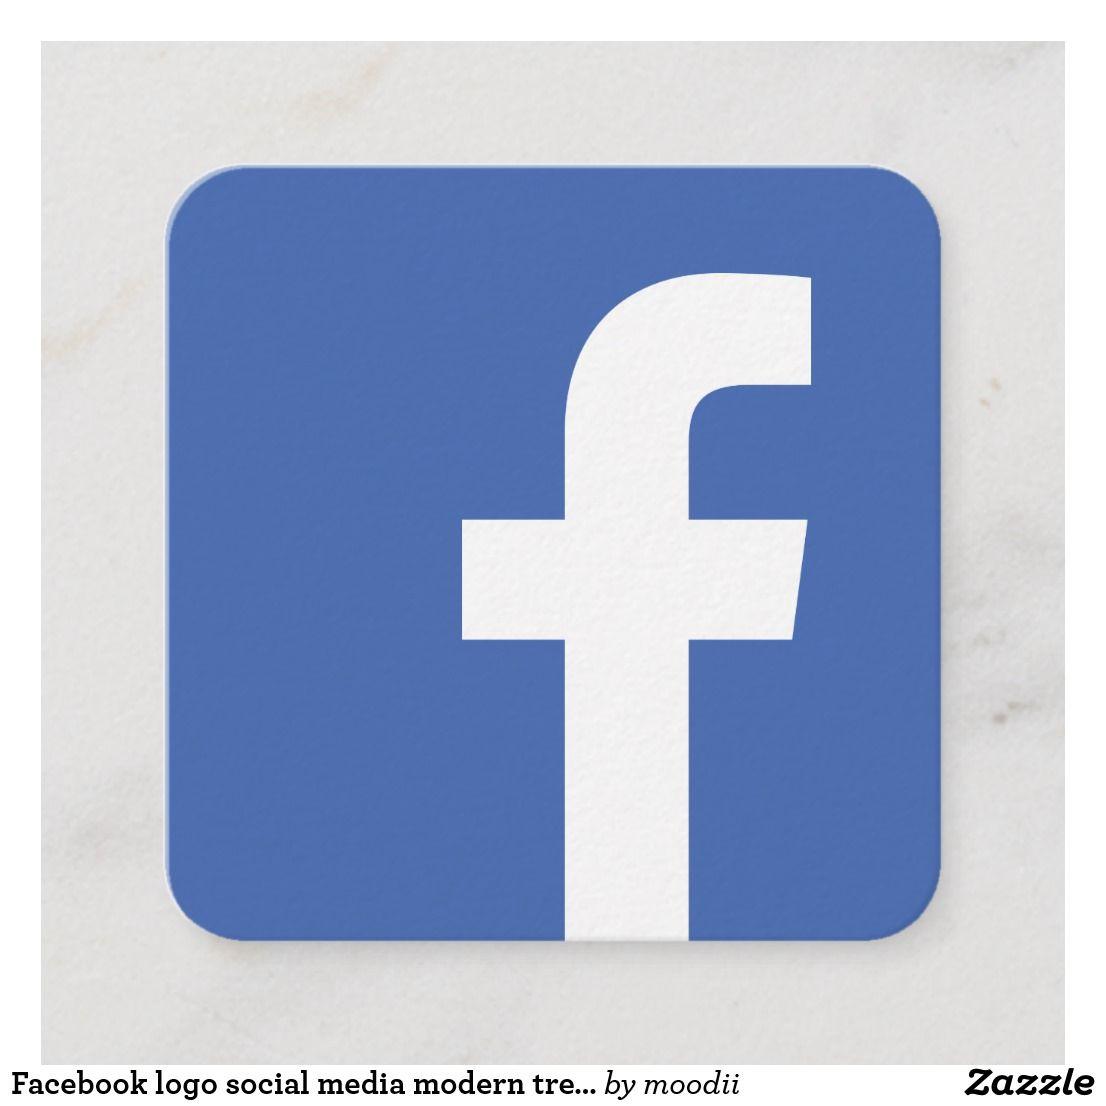 Facebook logo social media modern trendy business calling